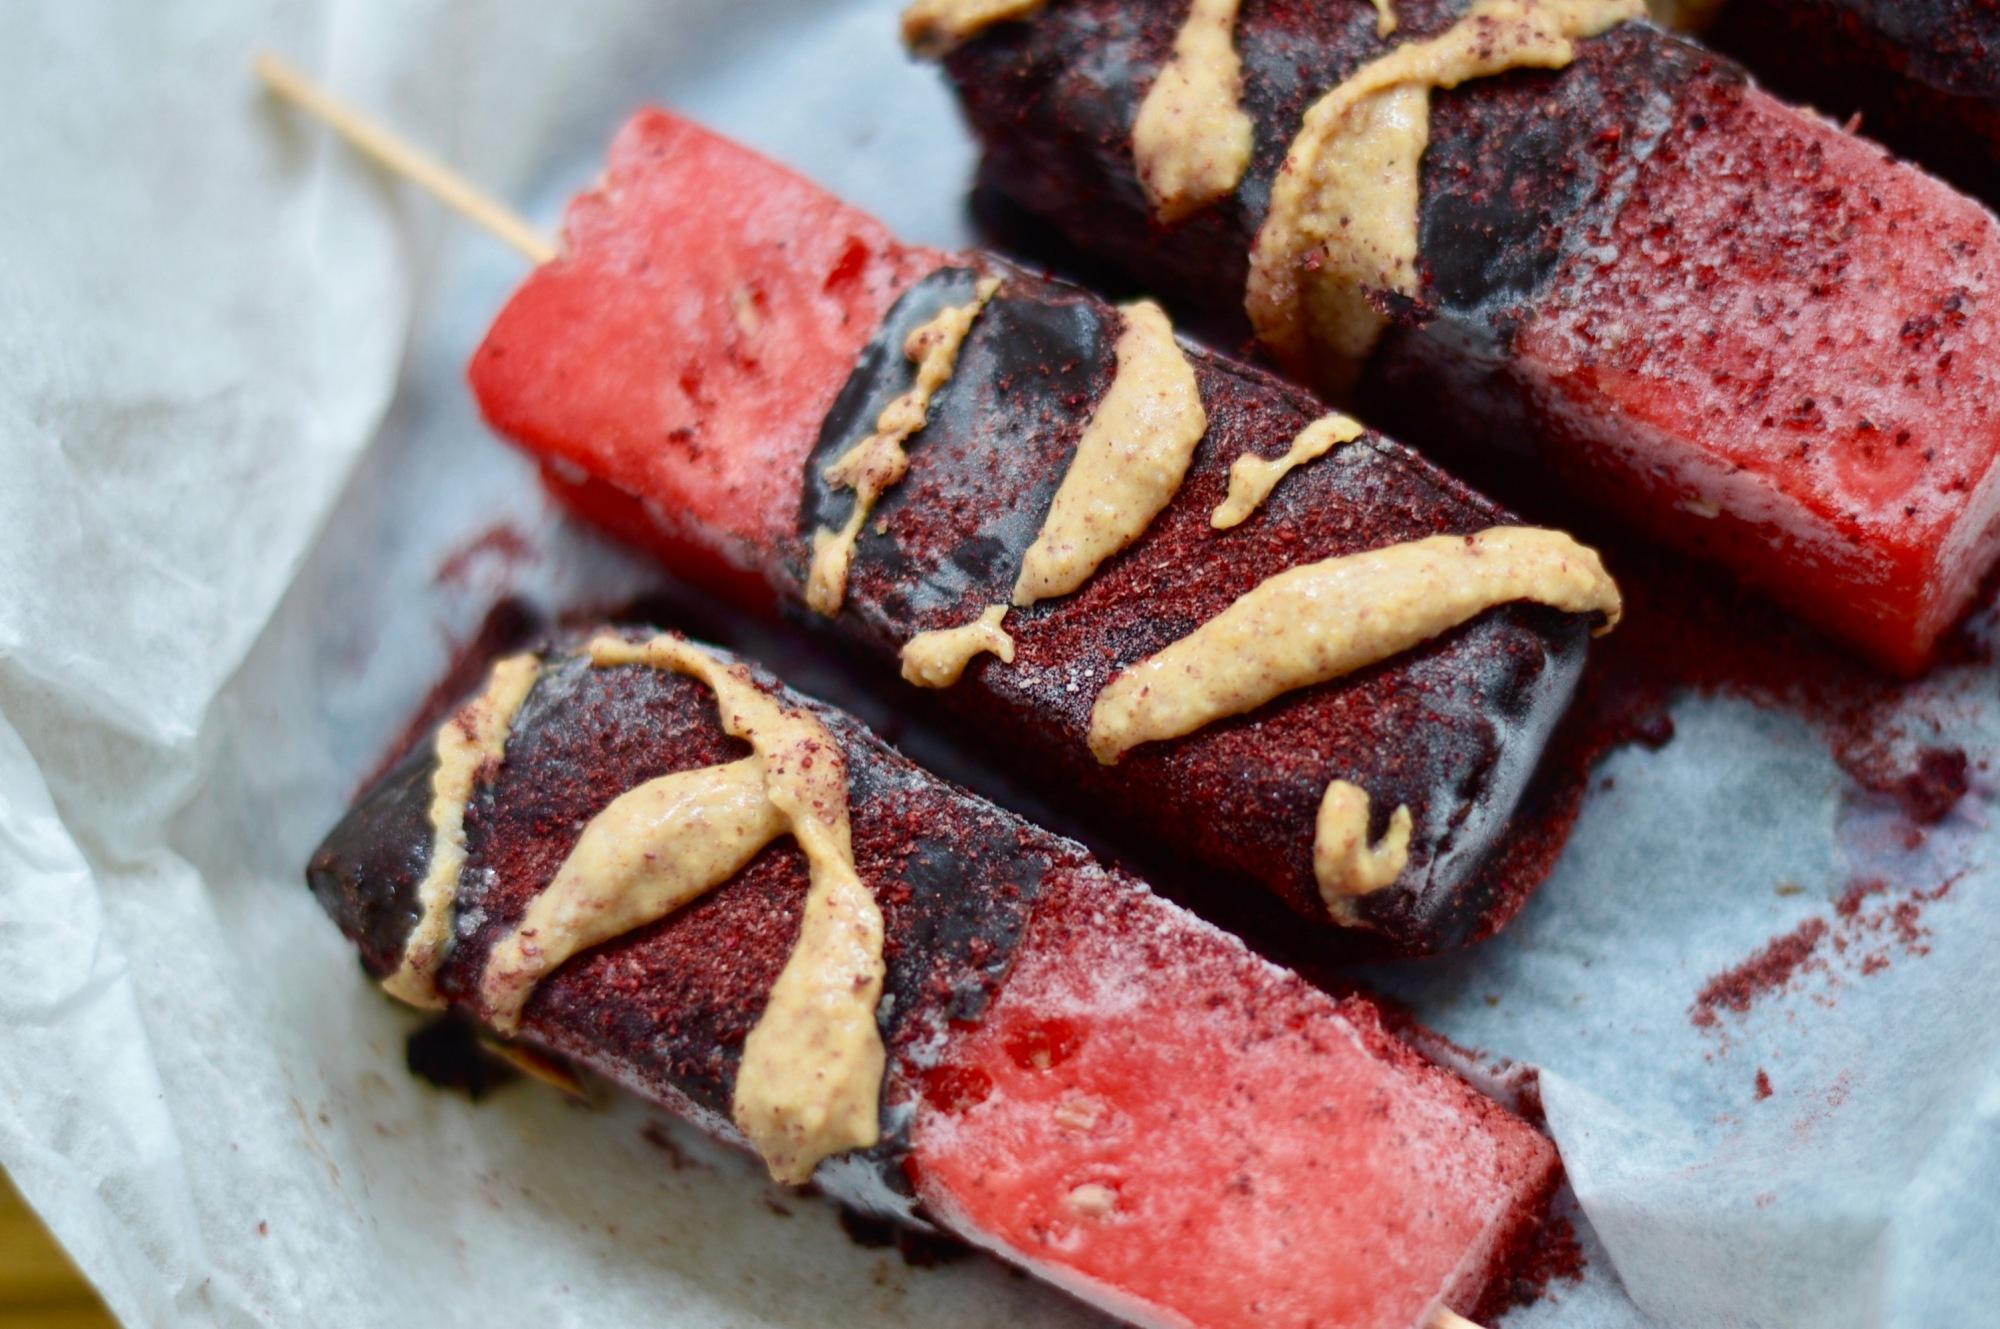 tacey Hogan - watermelon ice lollies